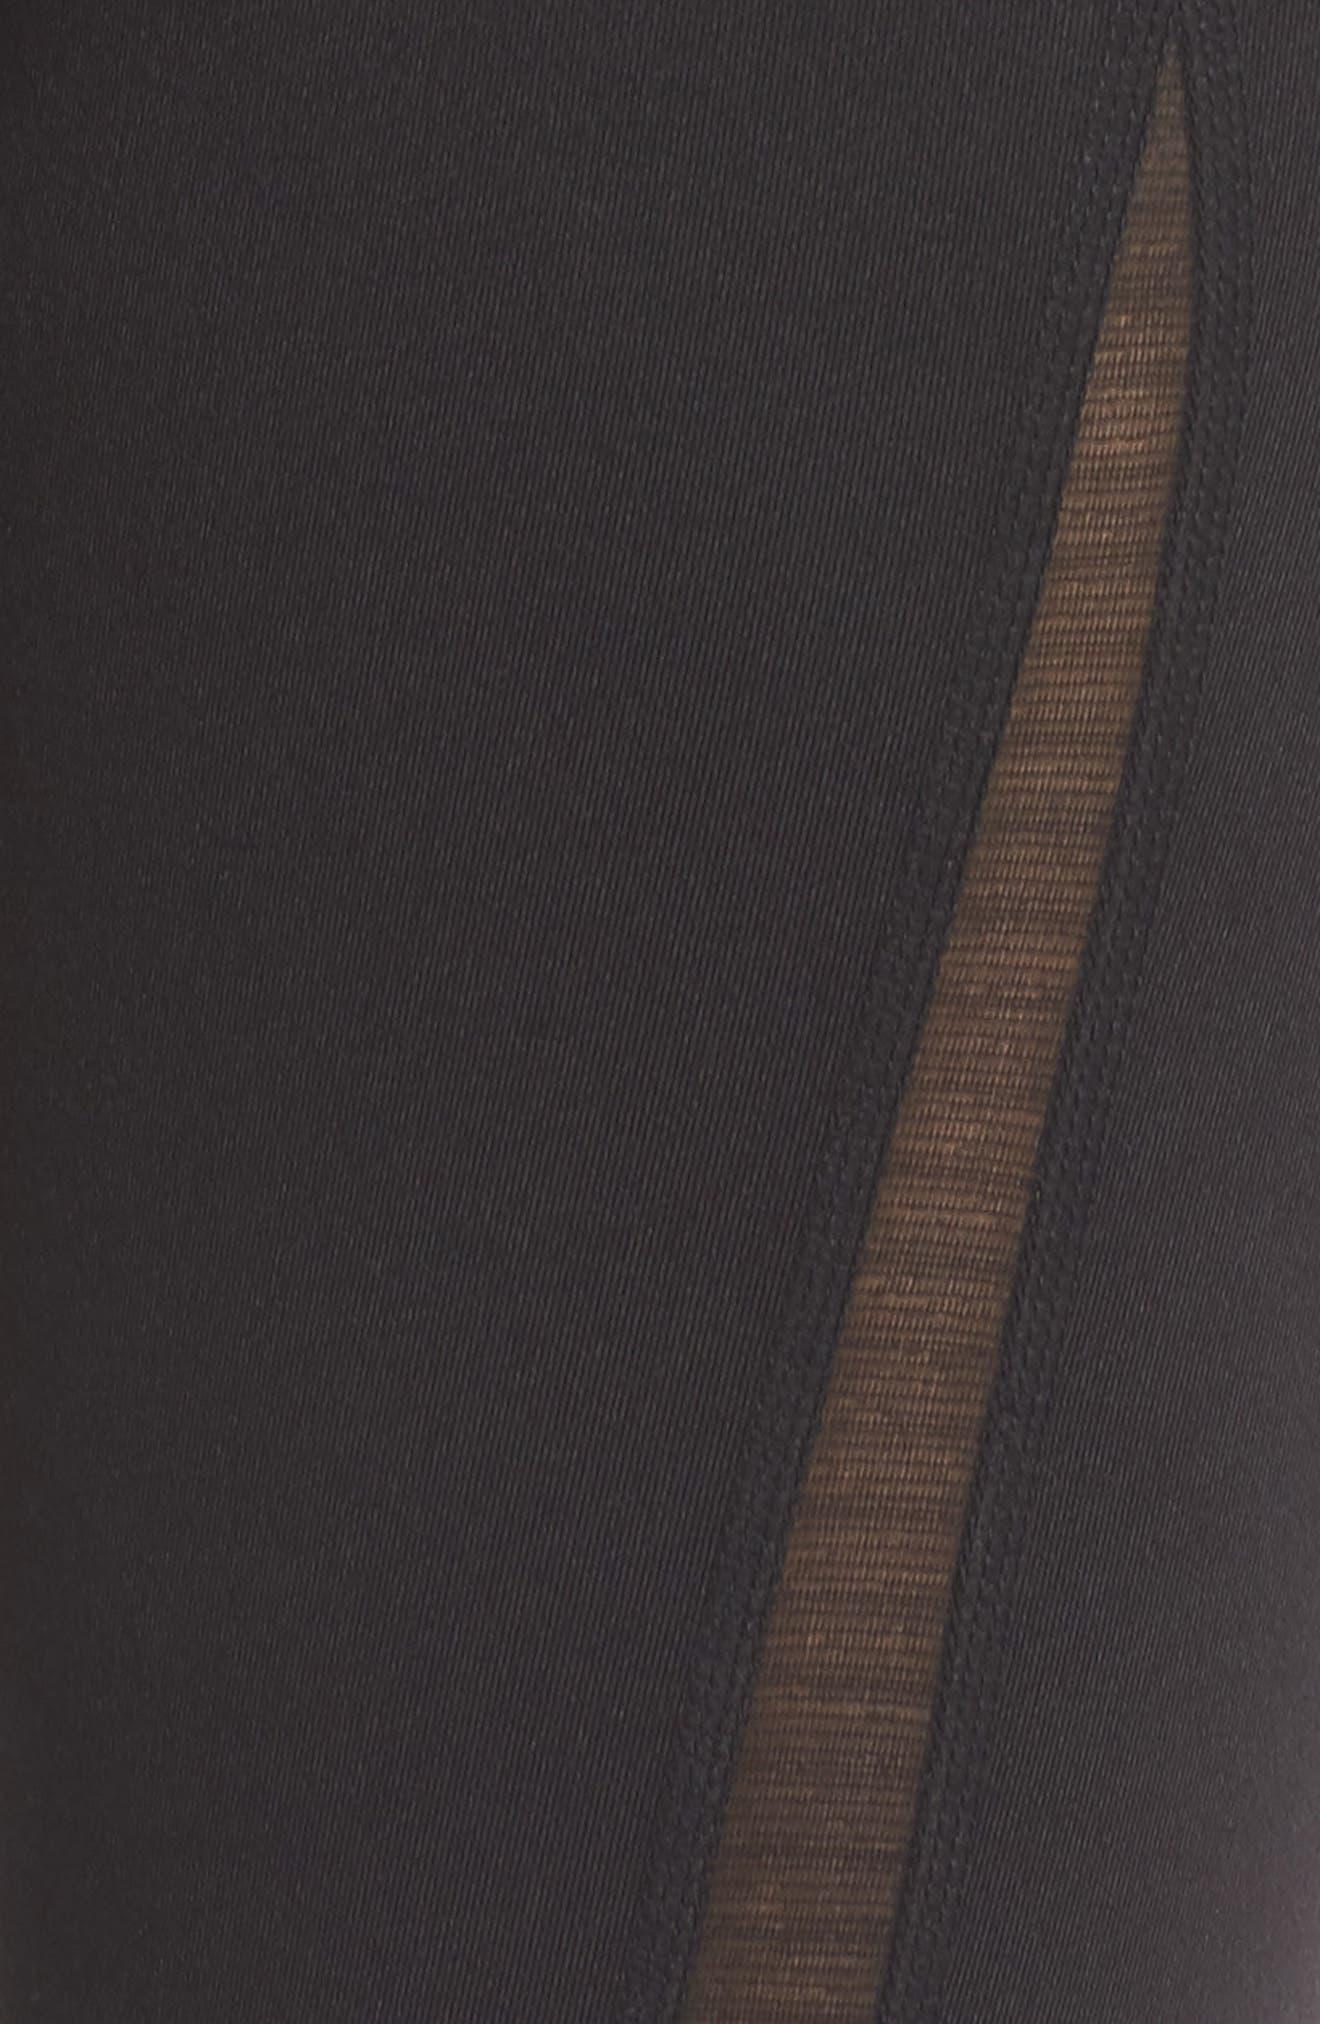 Reinvent Recycled High Waist Leggings,                             Alternate thumbnail 6, color,                             BLACK